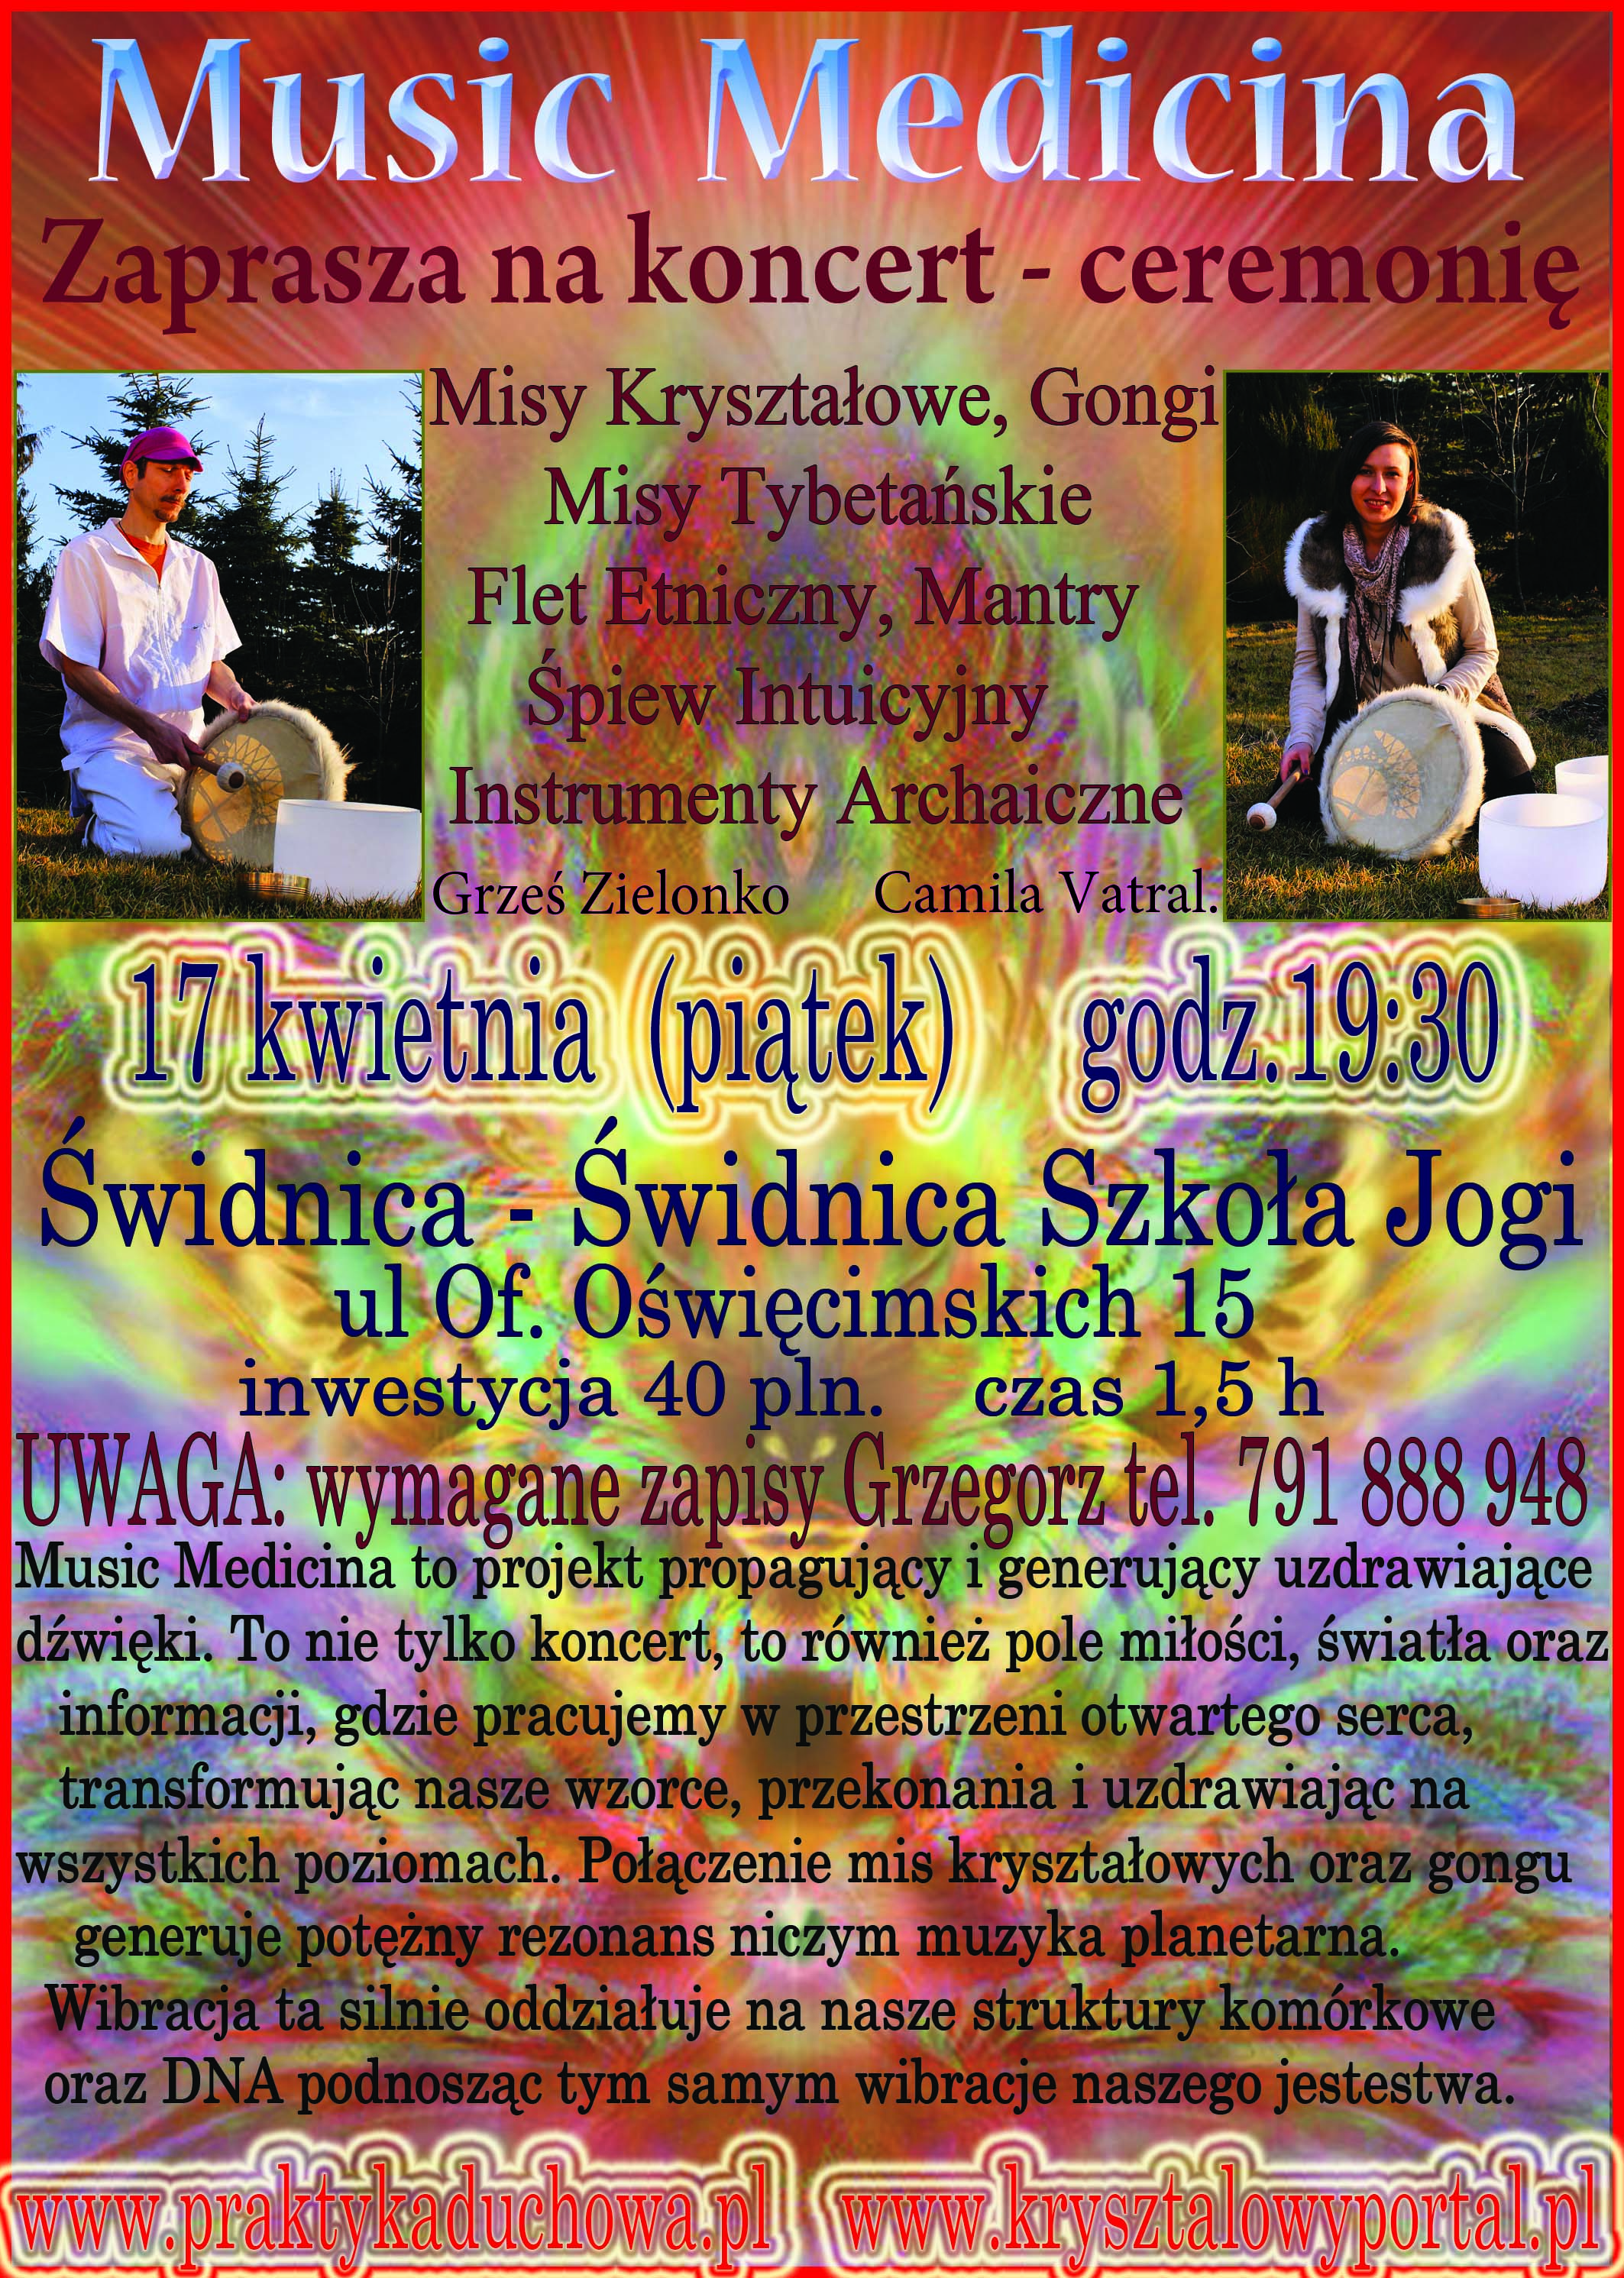 Music Medicina koncert ceremonia świdnica (2)